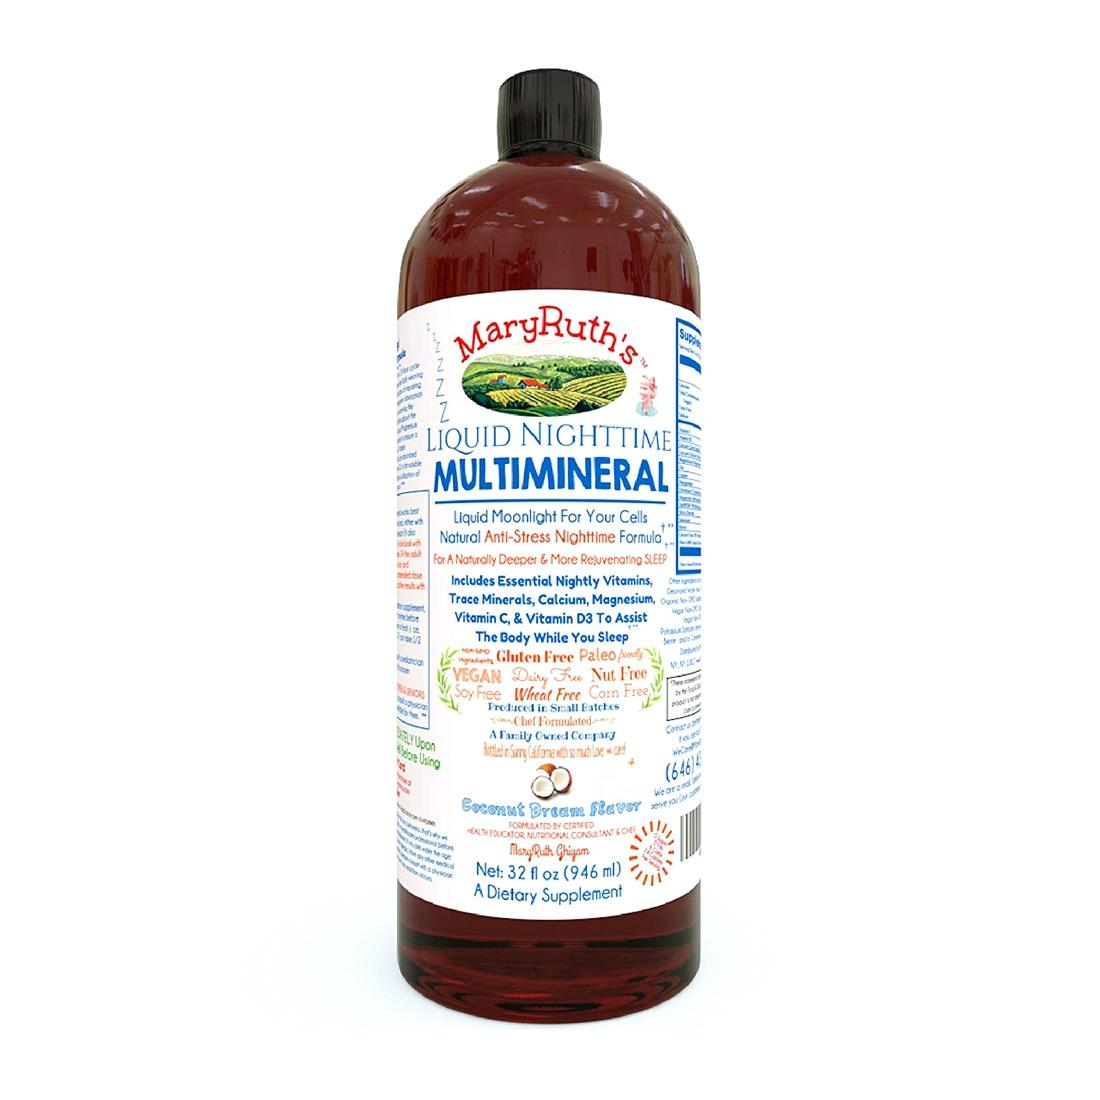 mary-ruth-organics-vegan-plant-based-liquid-nighttime-multimineral-bottle